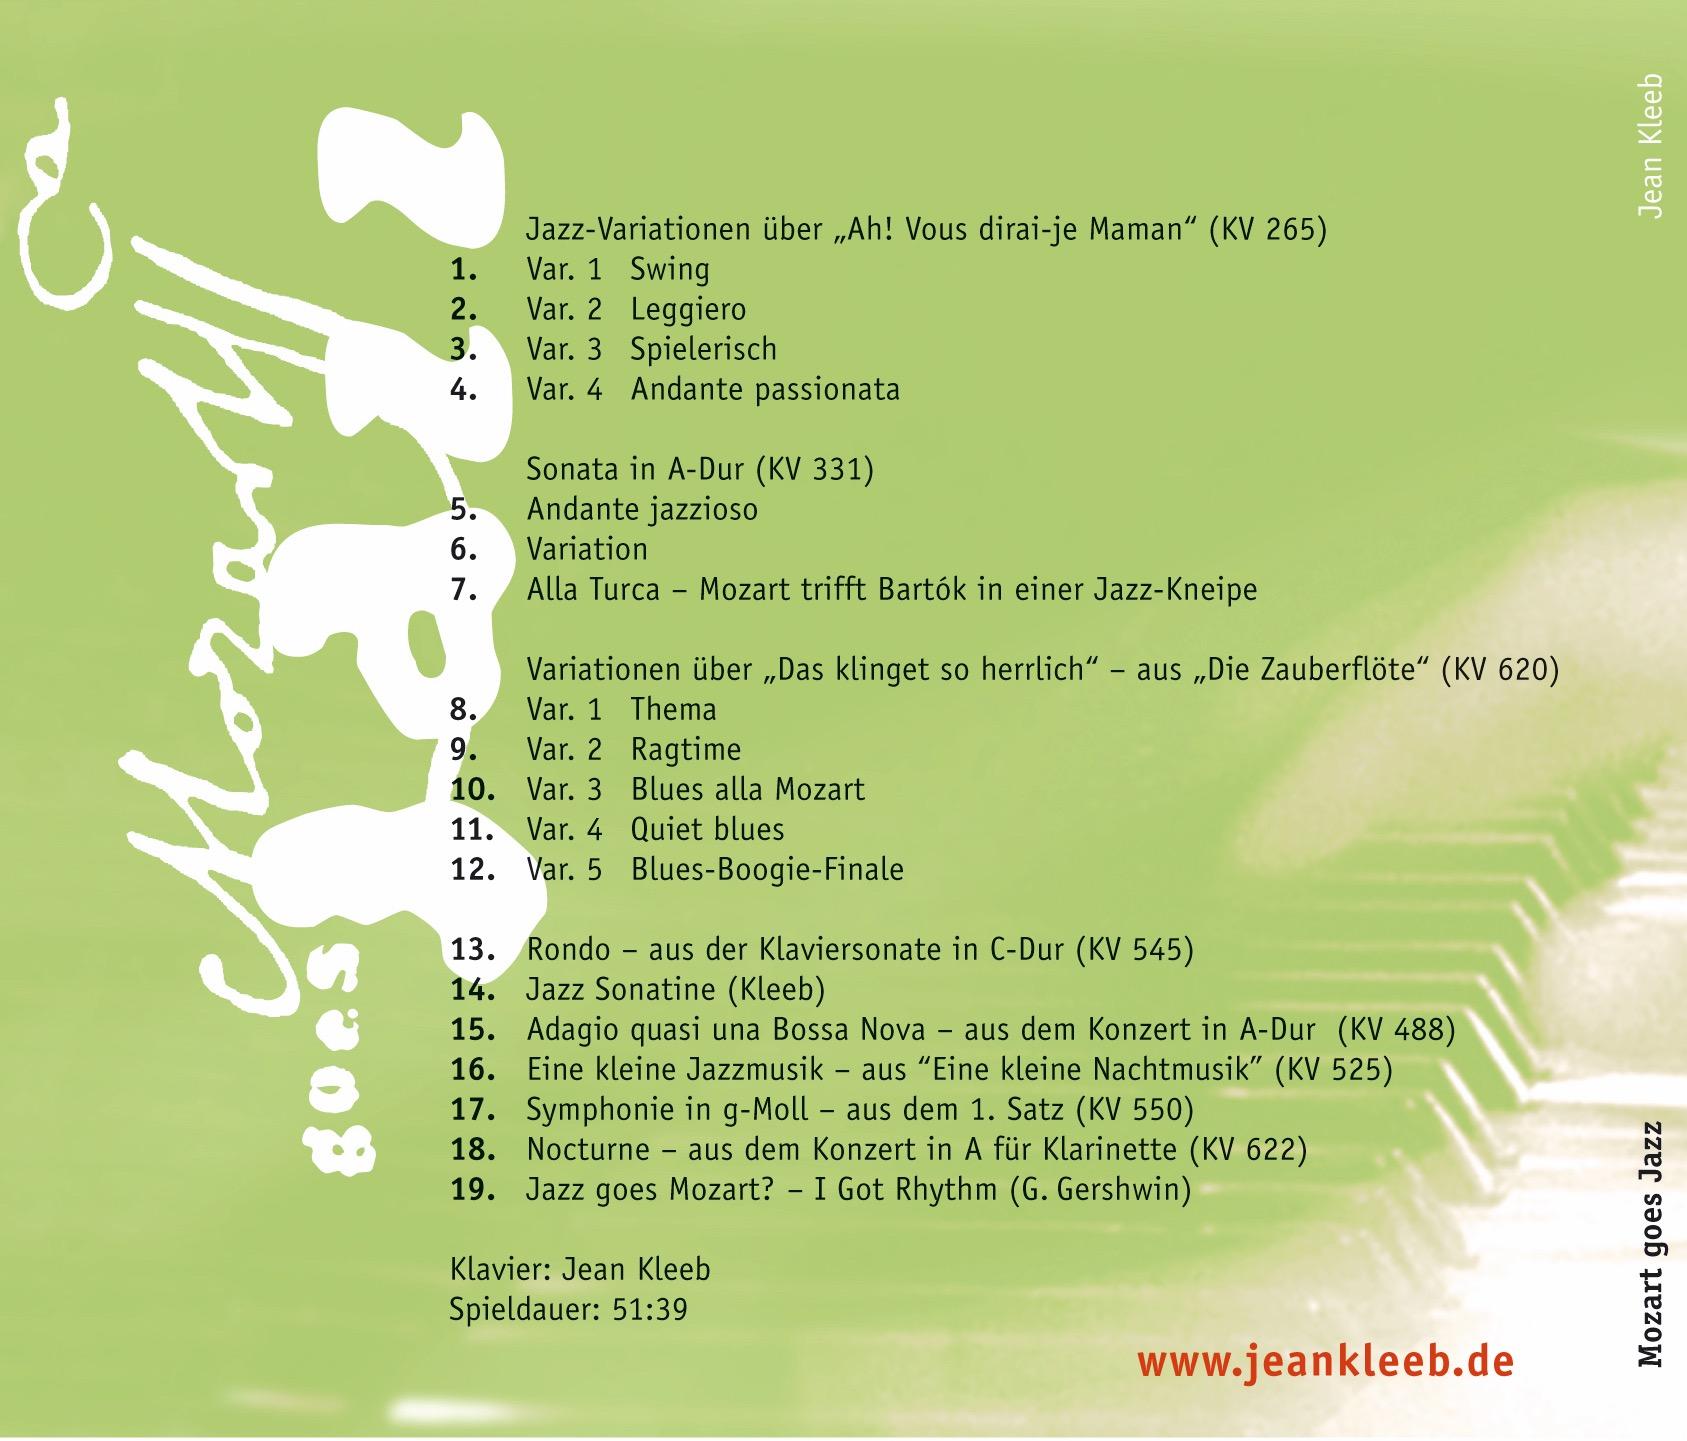 14.Mozart_goes_Jazz2.jpg